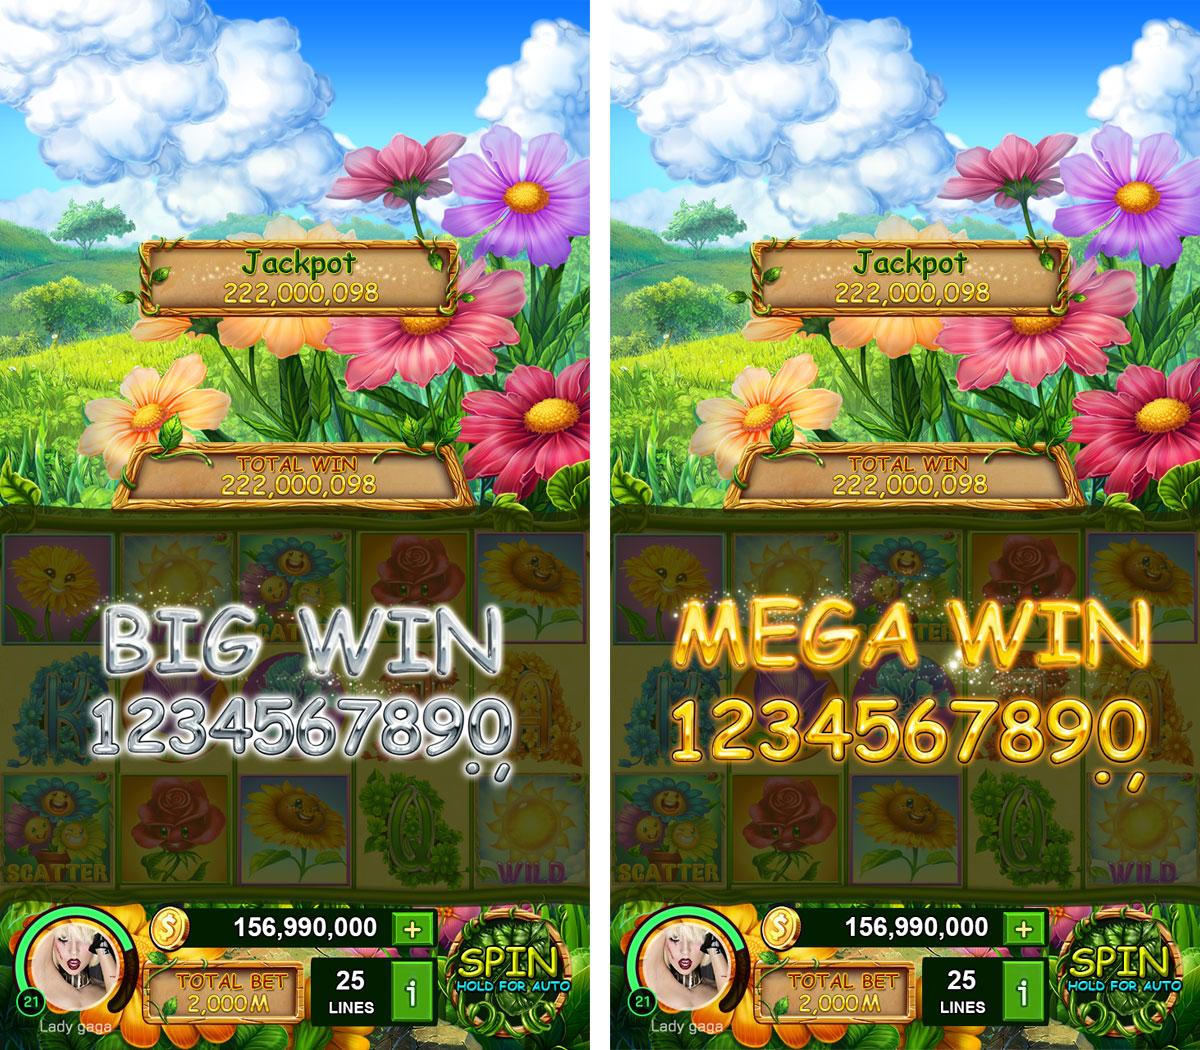 blossom_paradise_blog_bigwin_megawin